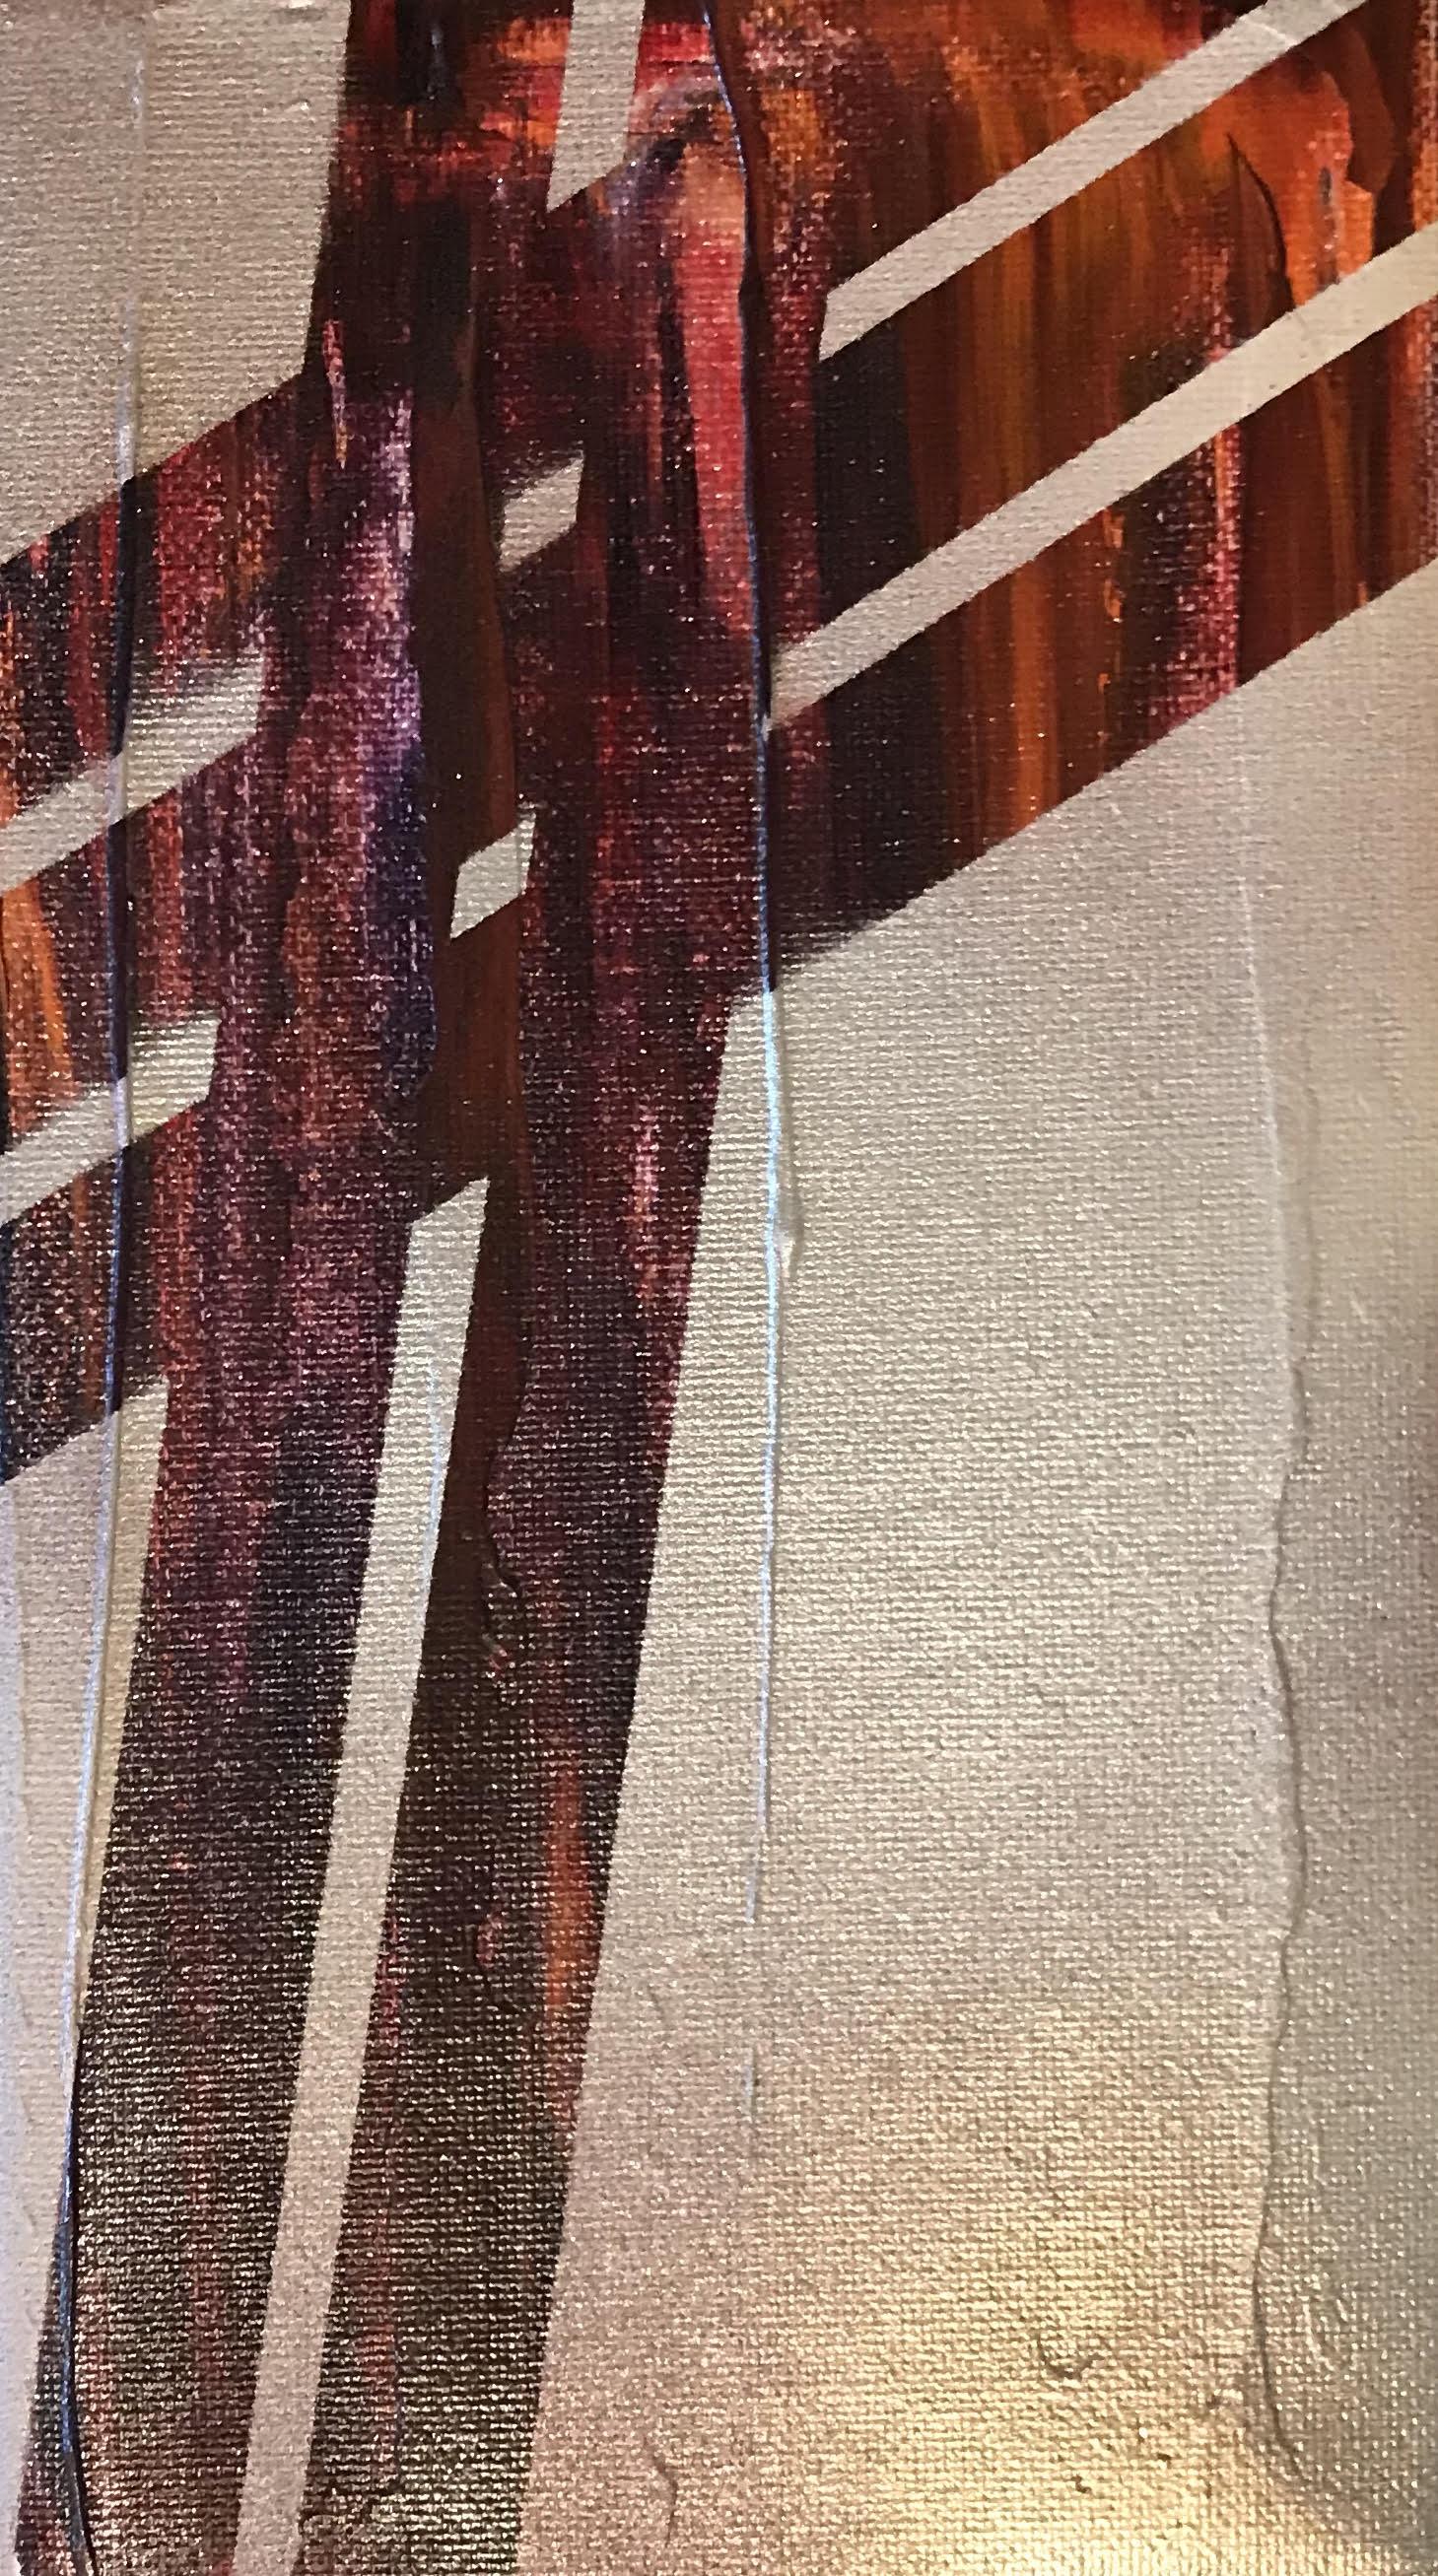 Cranes for DaysNo 1 - Spray Paint/Acrylic